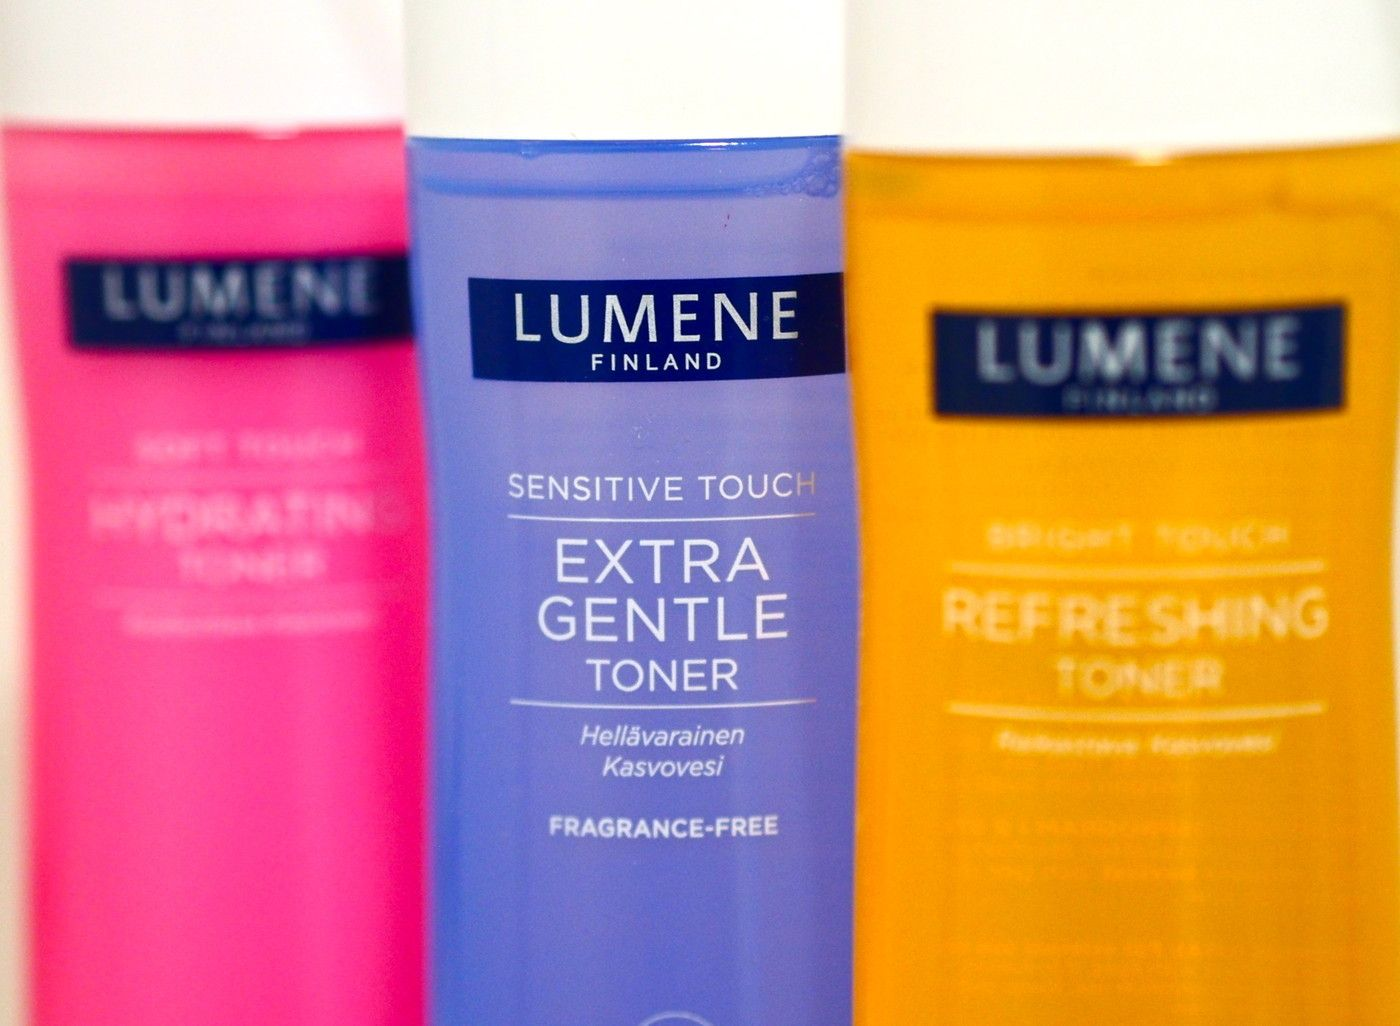 Blogger Hertta's skin care tip: add toner into a small spray bottle and spray on before adding moisturizer and serum. #skincare #lumene